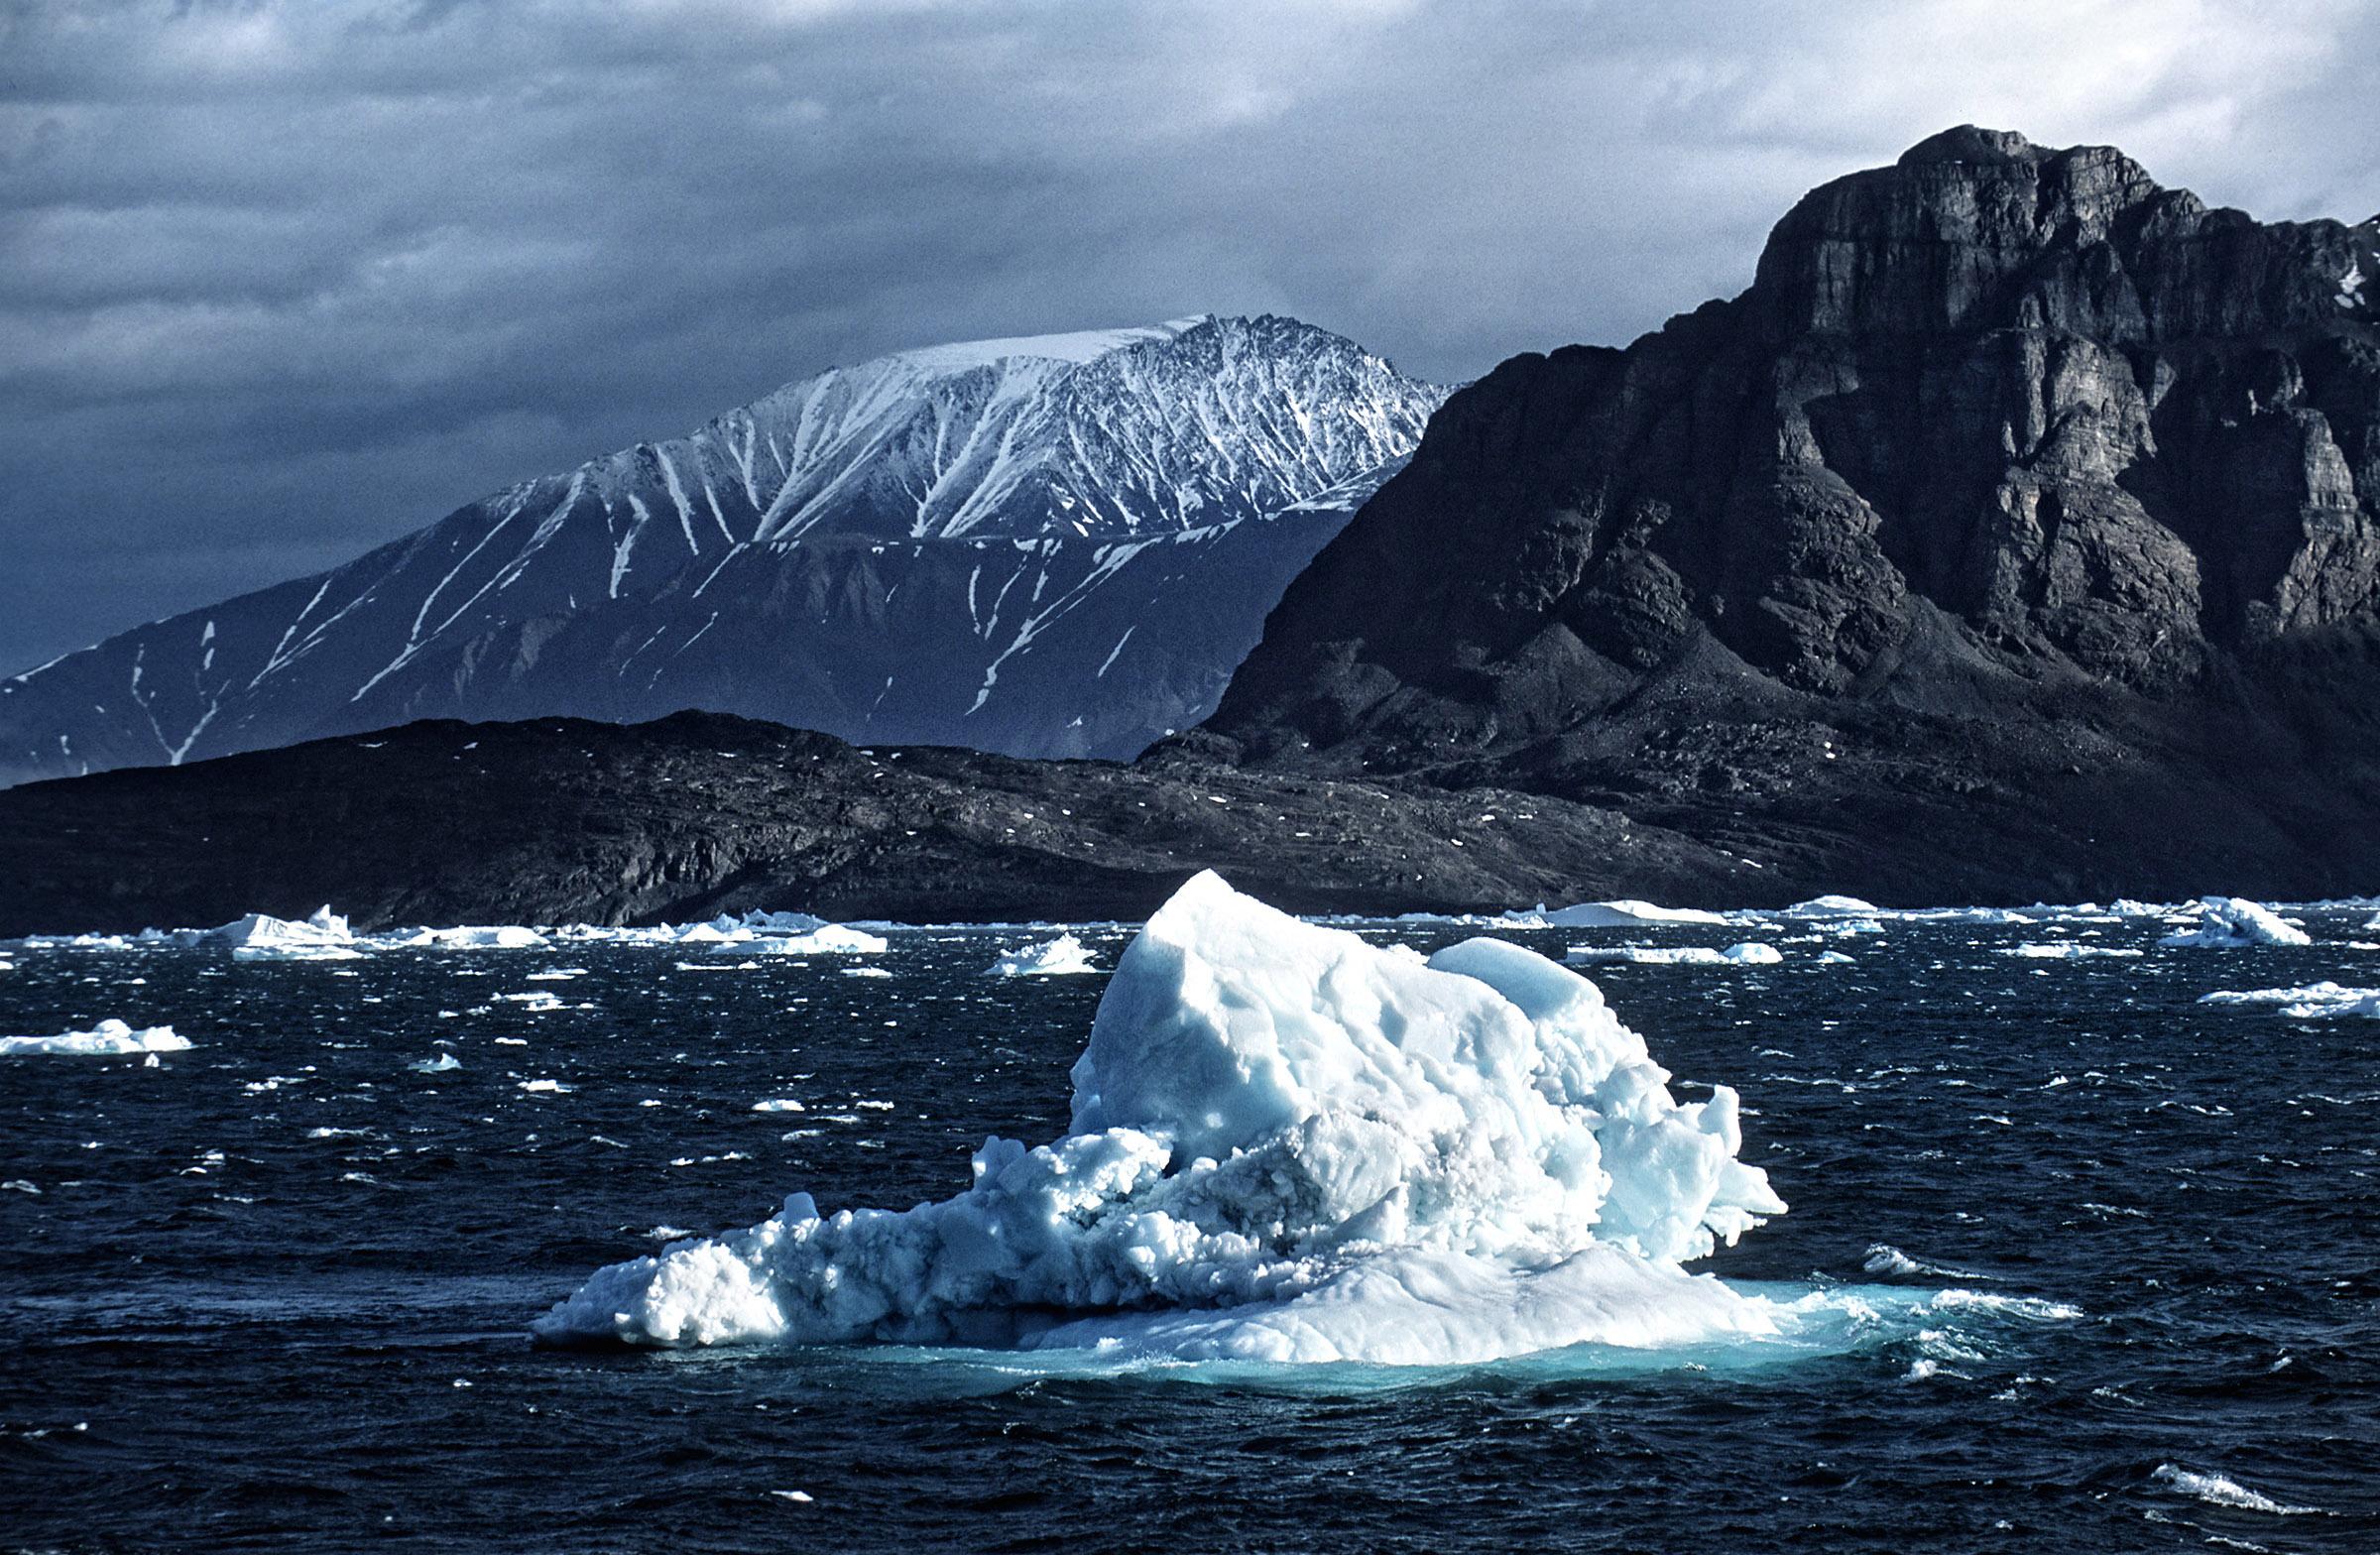 greenland-iceberg-mountain-storm